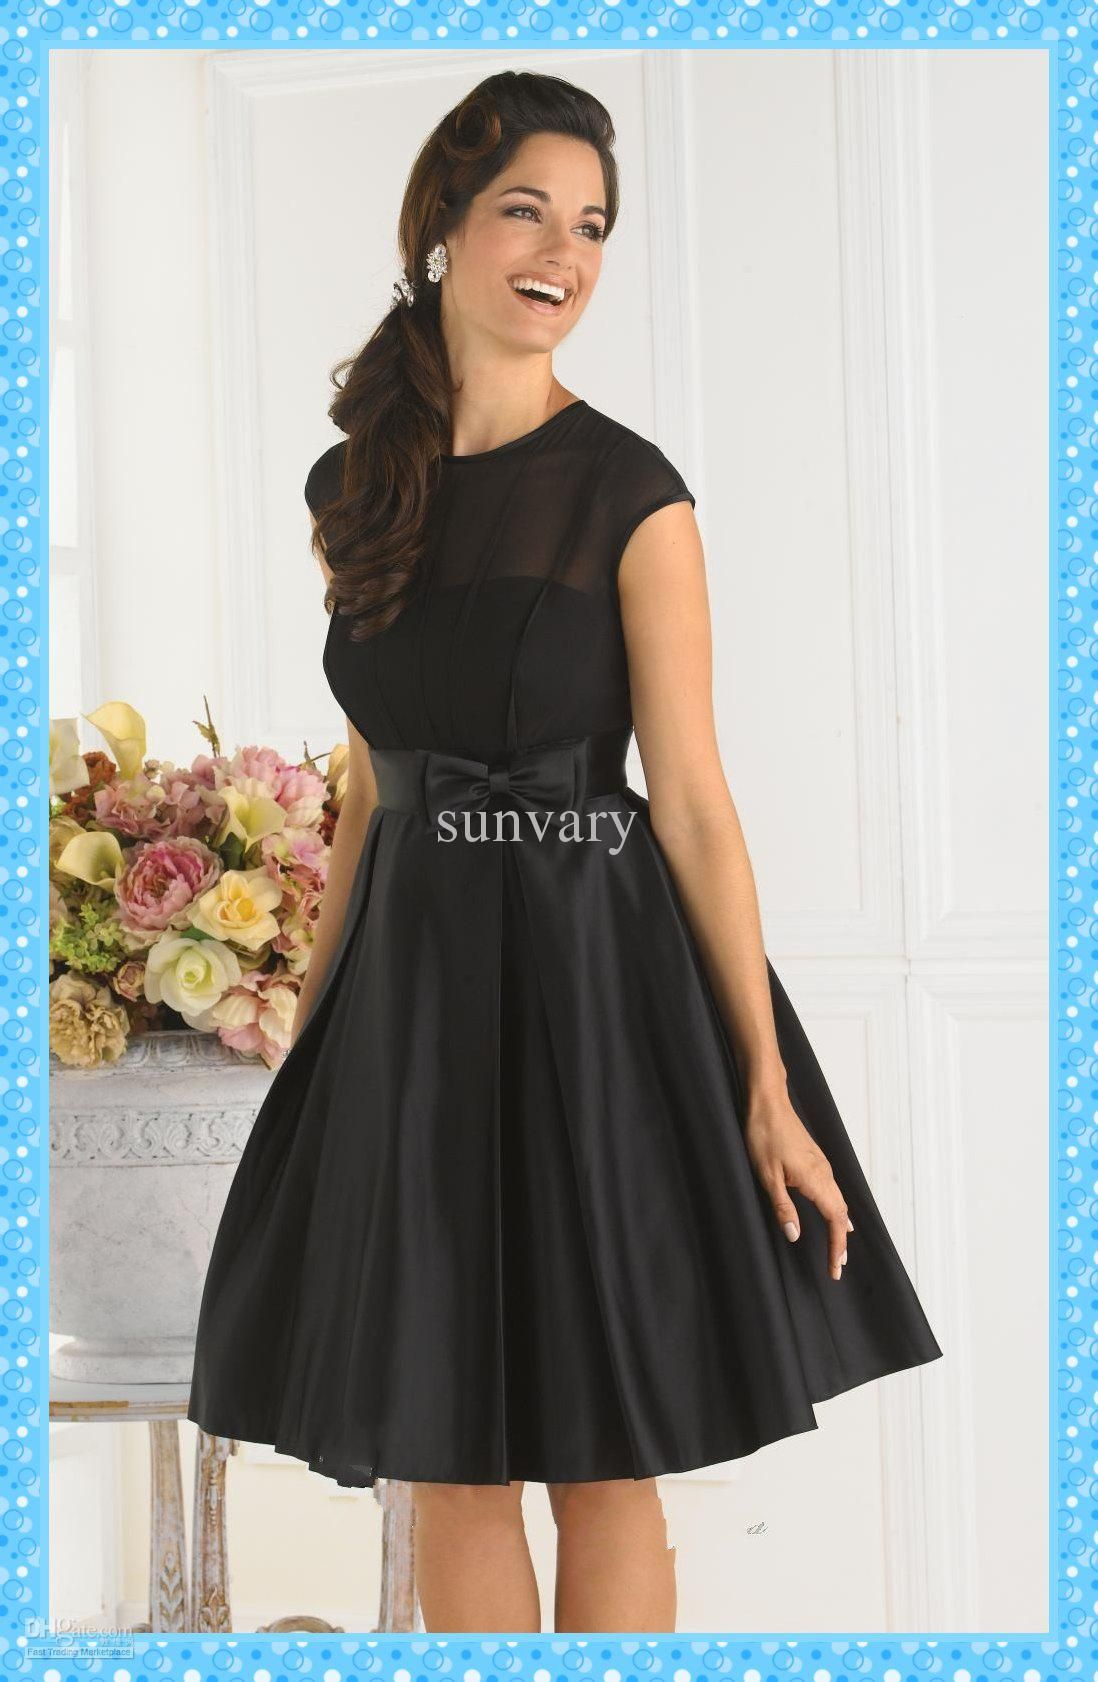 Wholesale Simple Cheap Black Cocktail Dress A-line Jewel Cap Sleeves Knee  Length Bow Satin Party Dresses 60a487d8db61